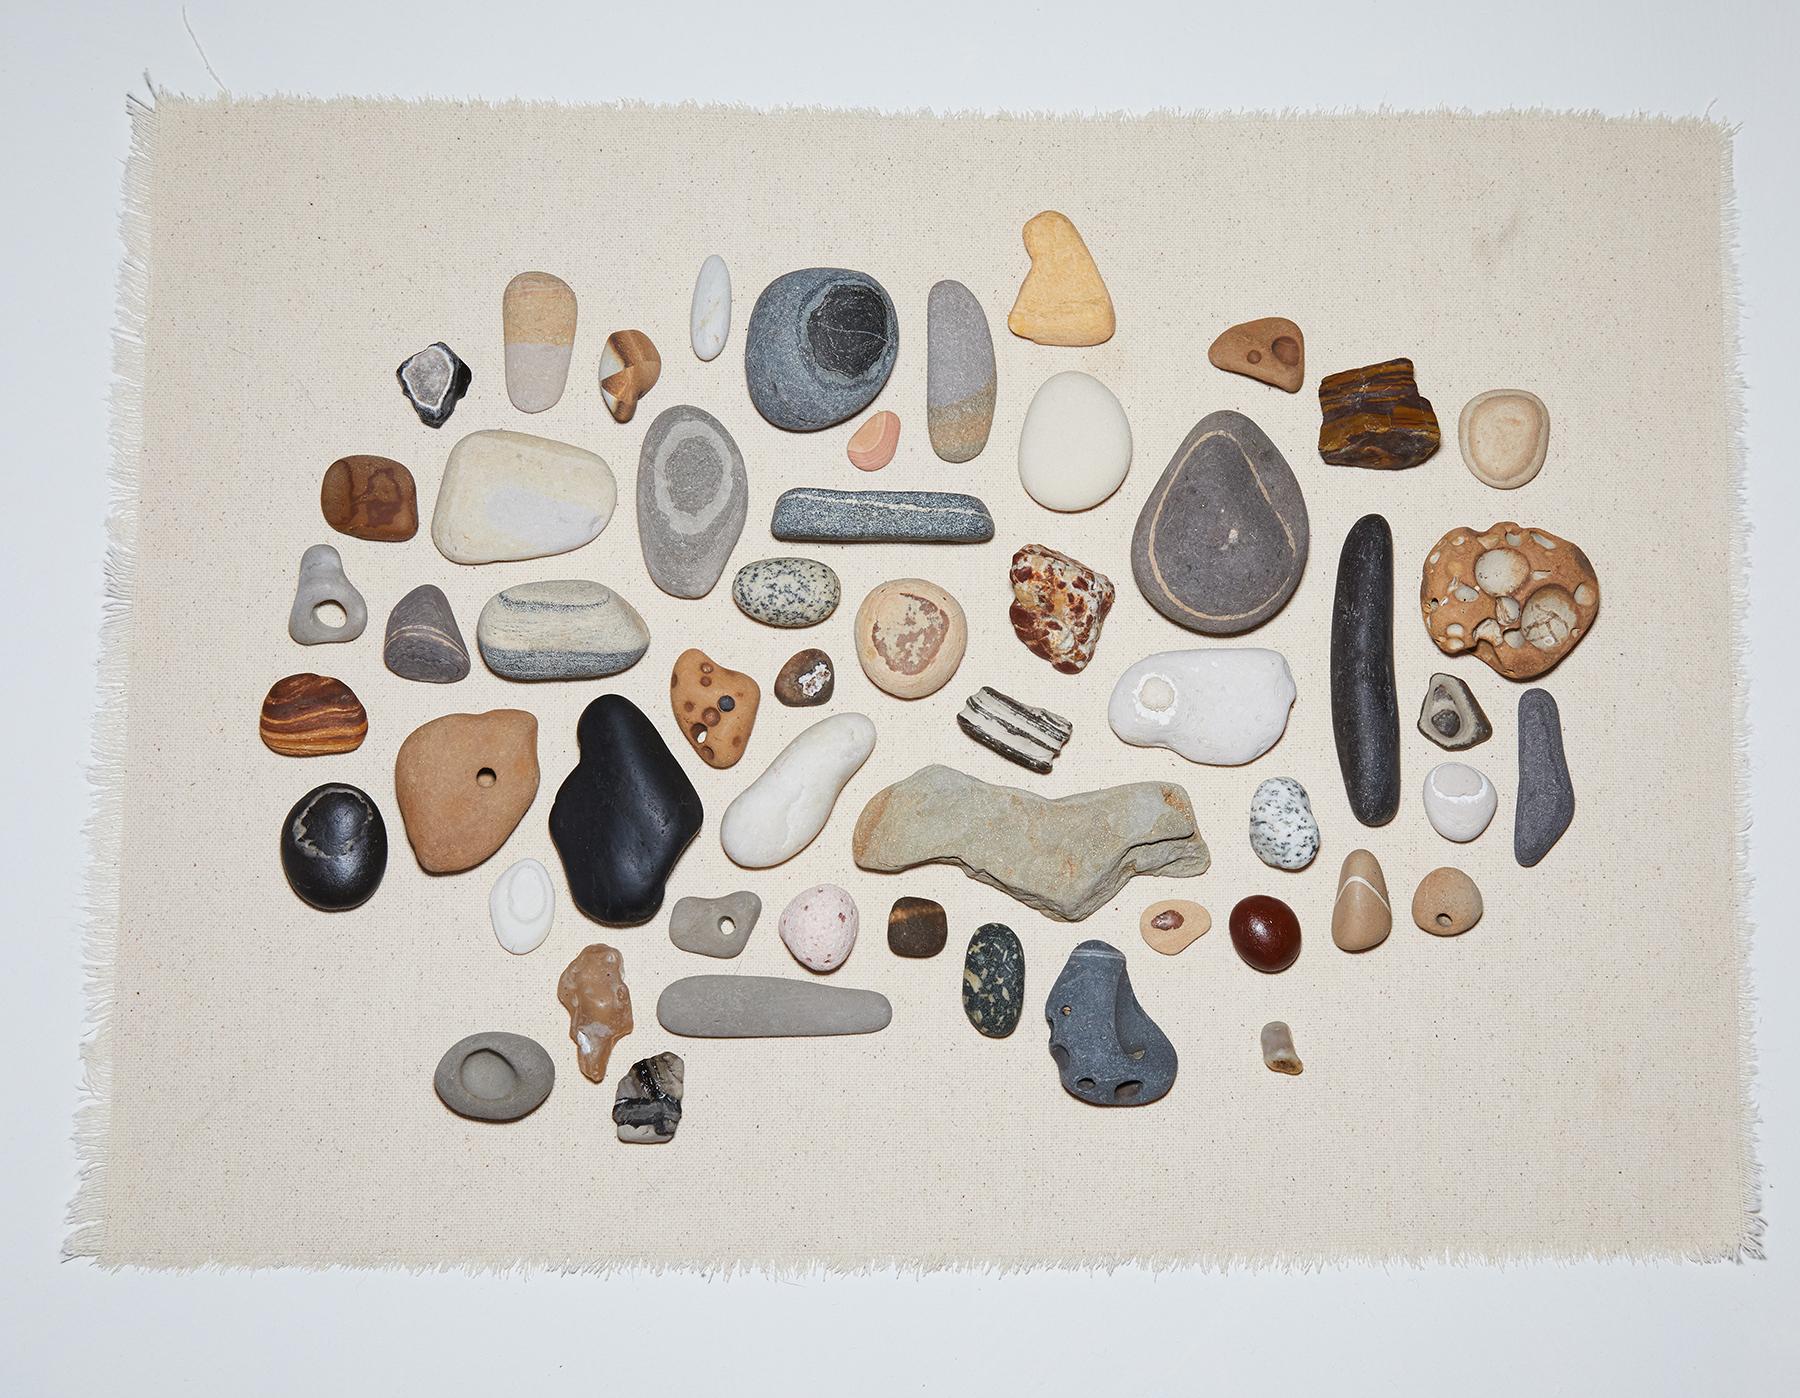 Callidus Guild: The Stone Show – SURFACE